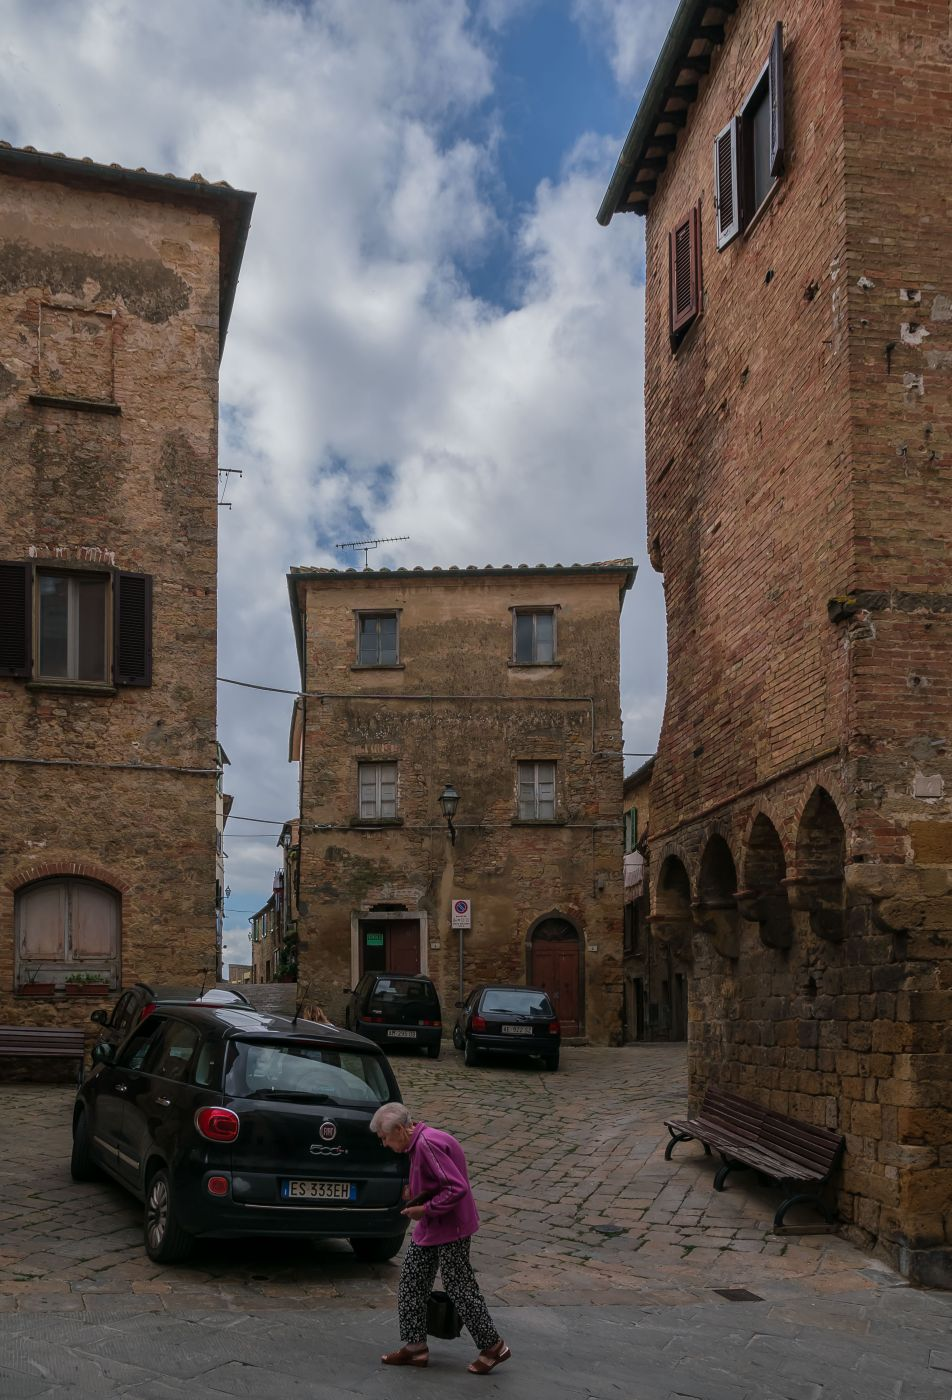 Centro storico, Volterra, Italy